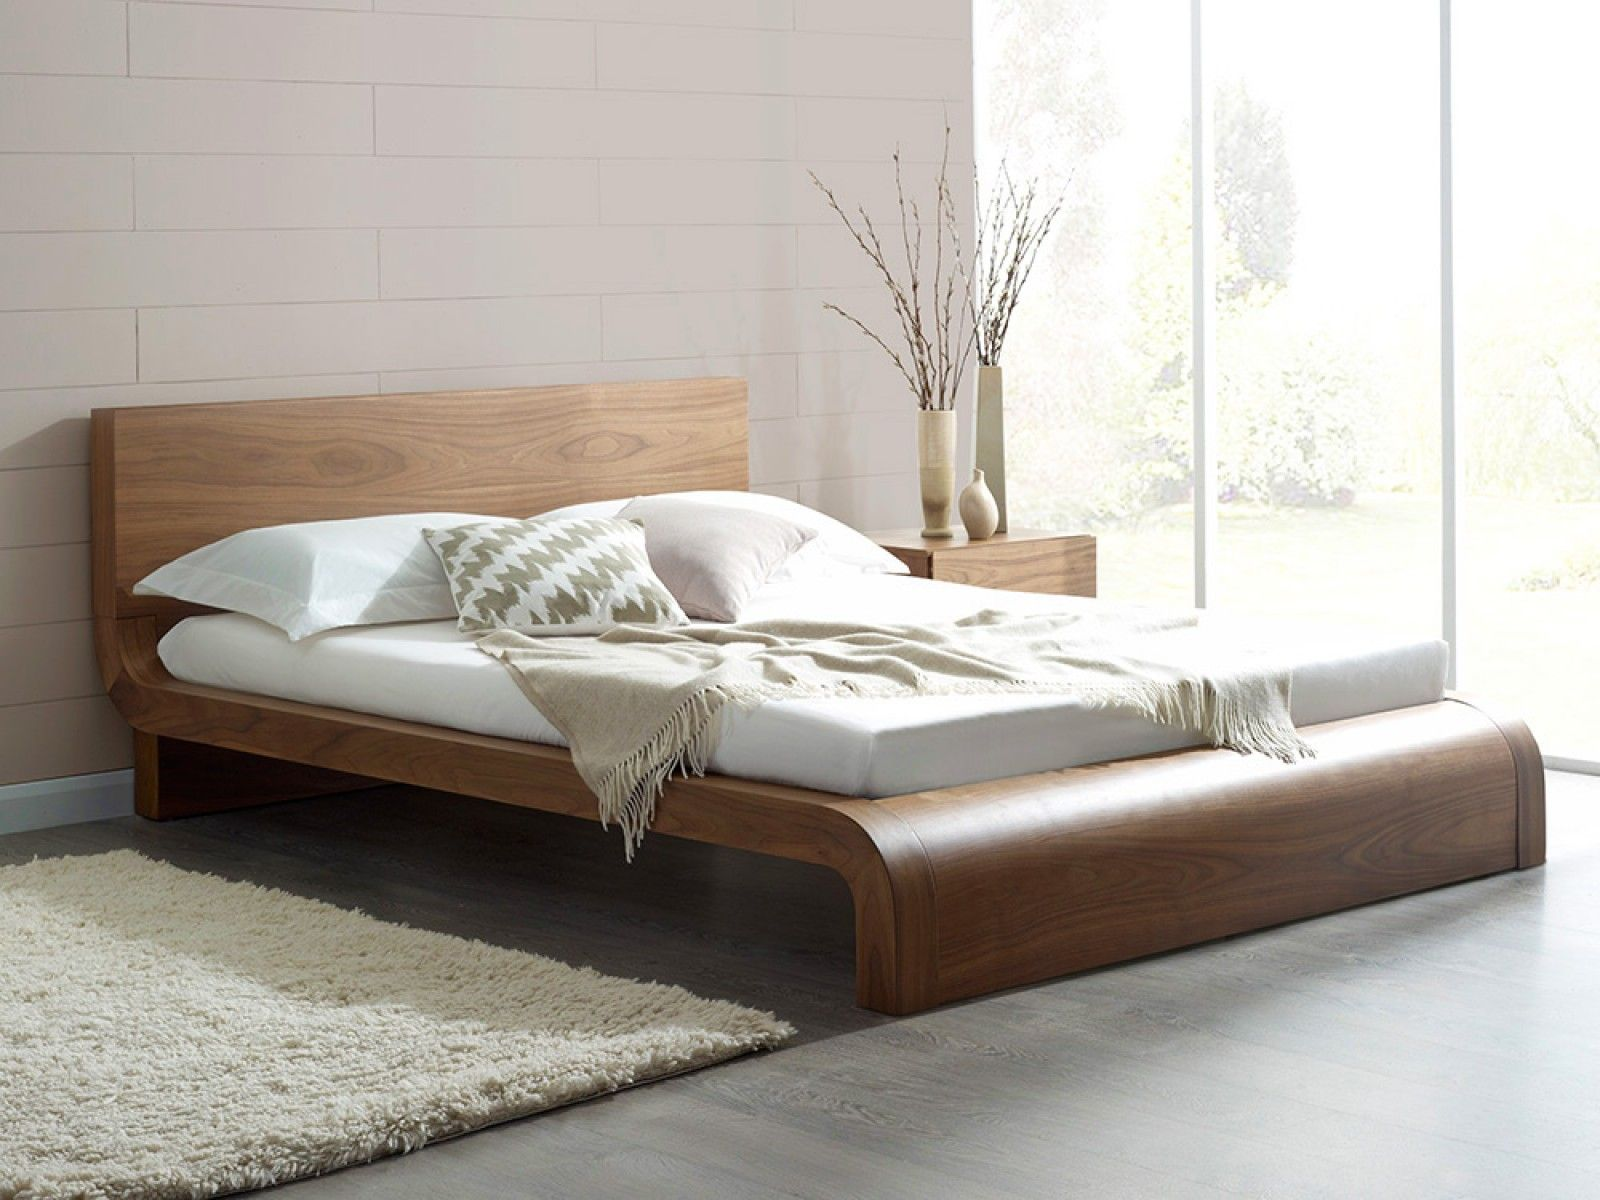 Roma Natural Walnut Bed Walnut Bedroom Furniture Bedroom Bed